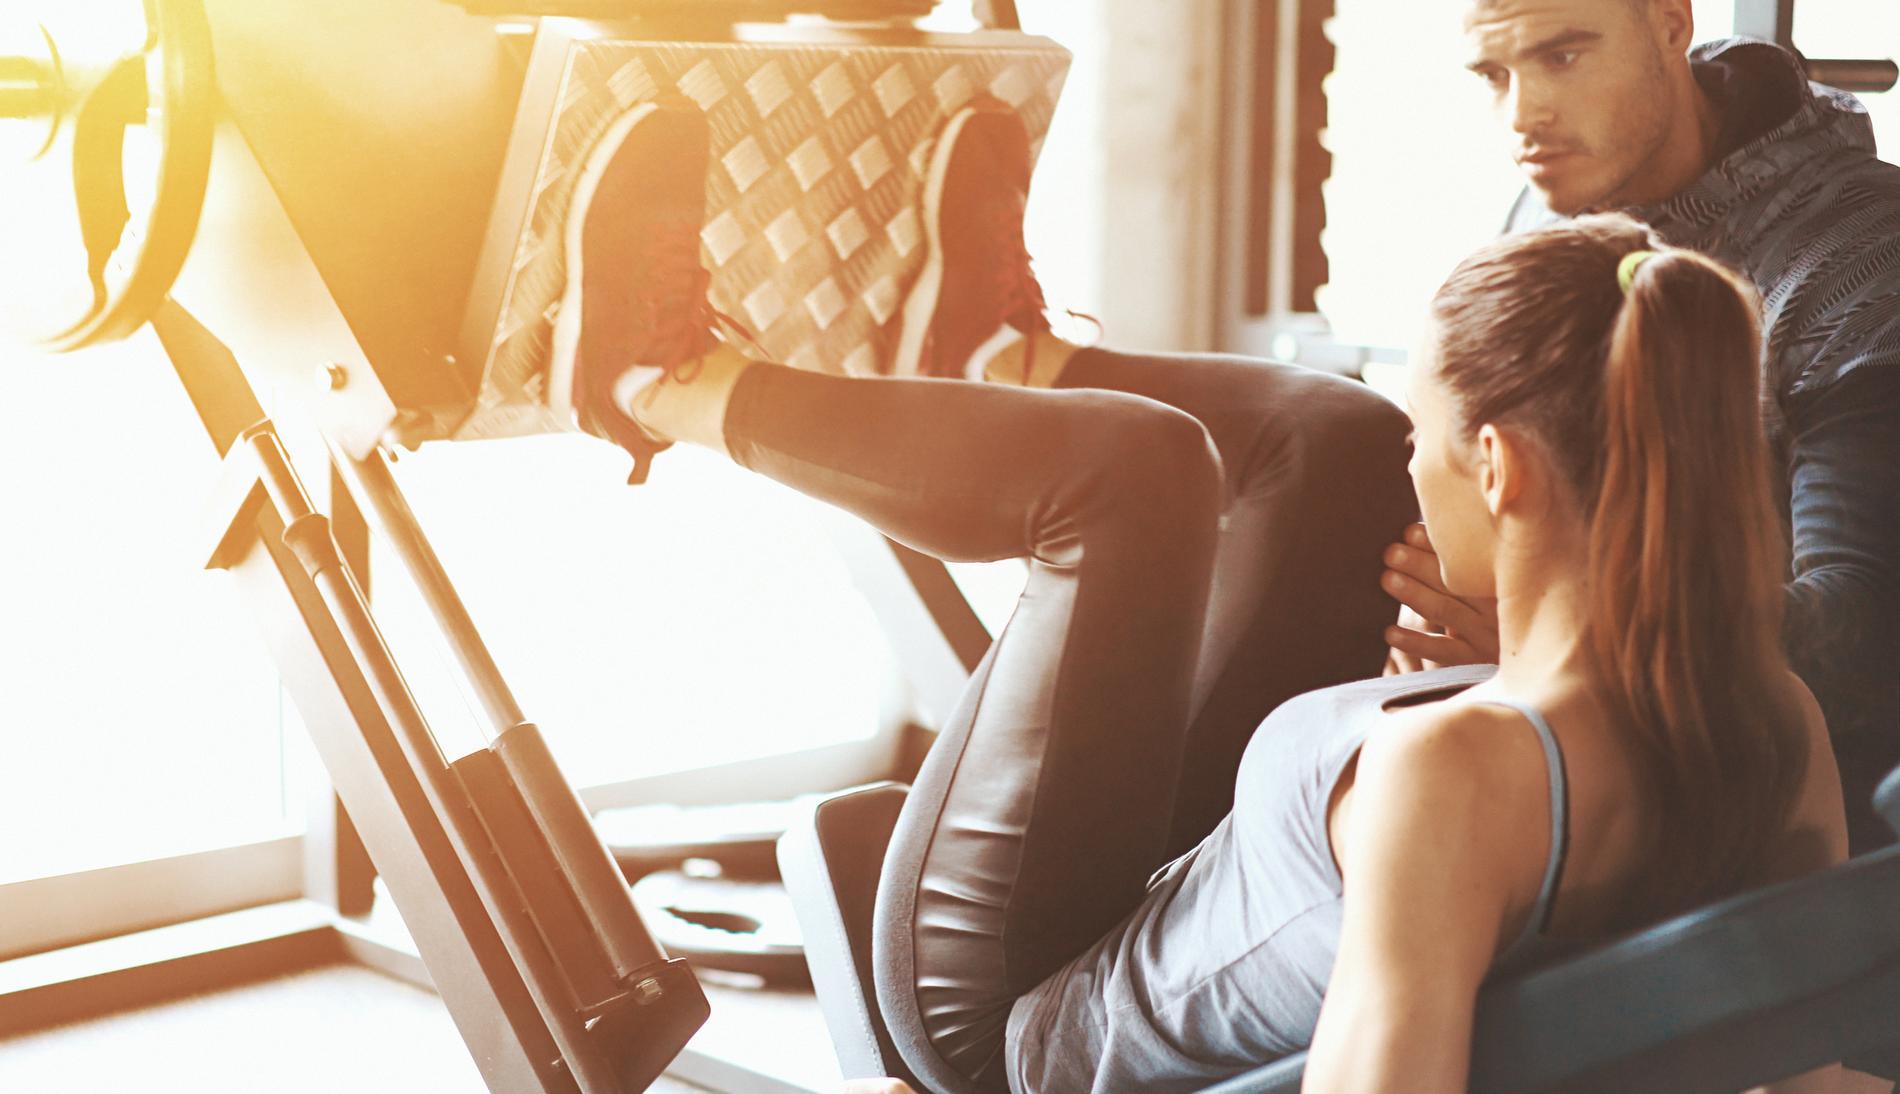 Fesses Tailles Cuisses 5 Exercices Pour Muscler Le Bas De Son Corps Madame Figaro